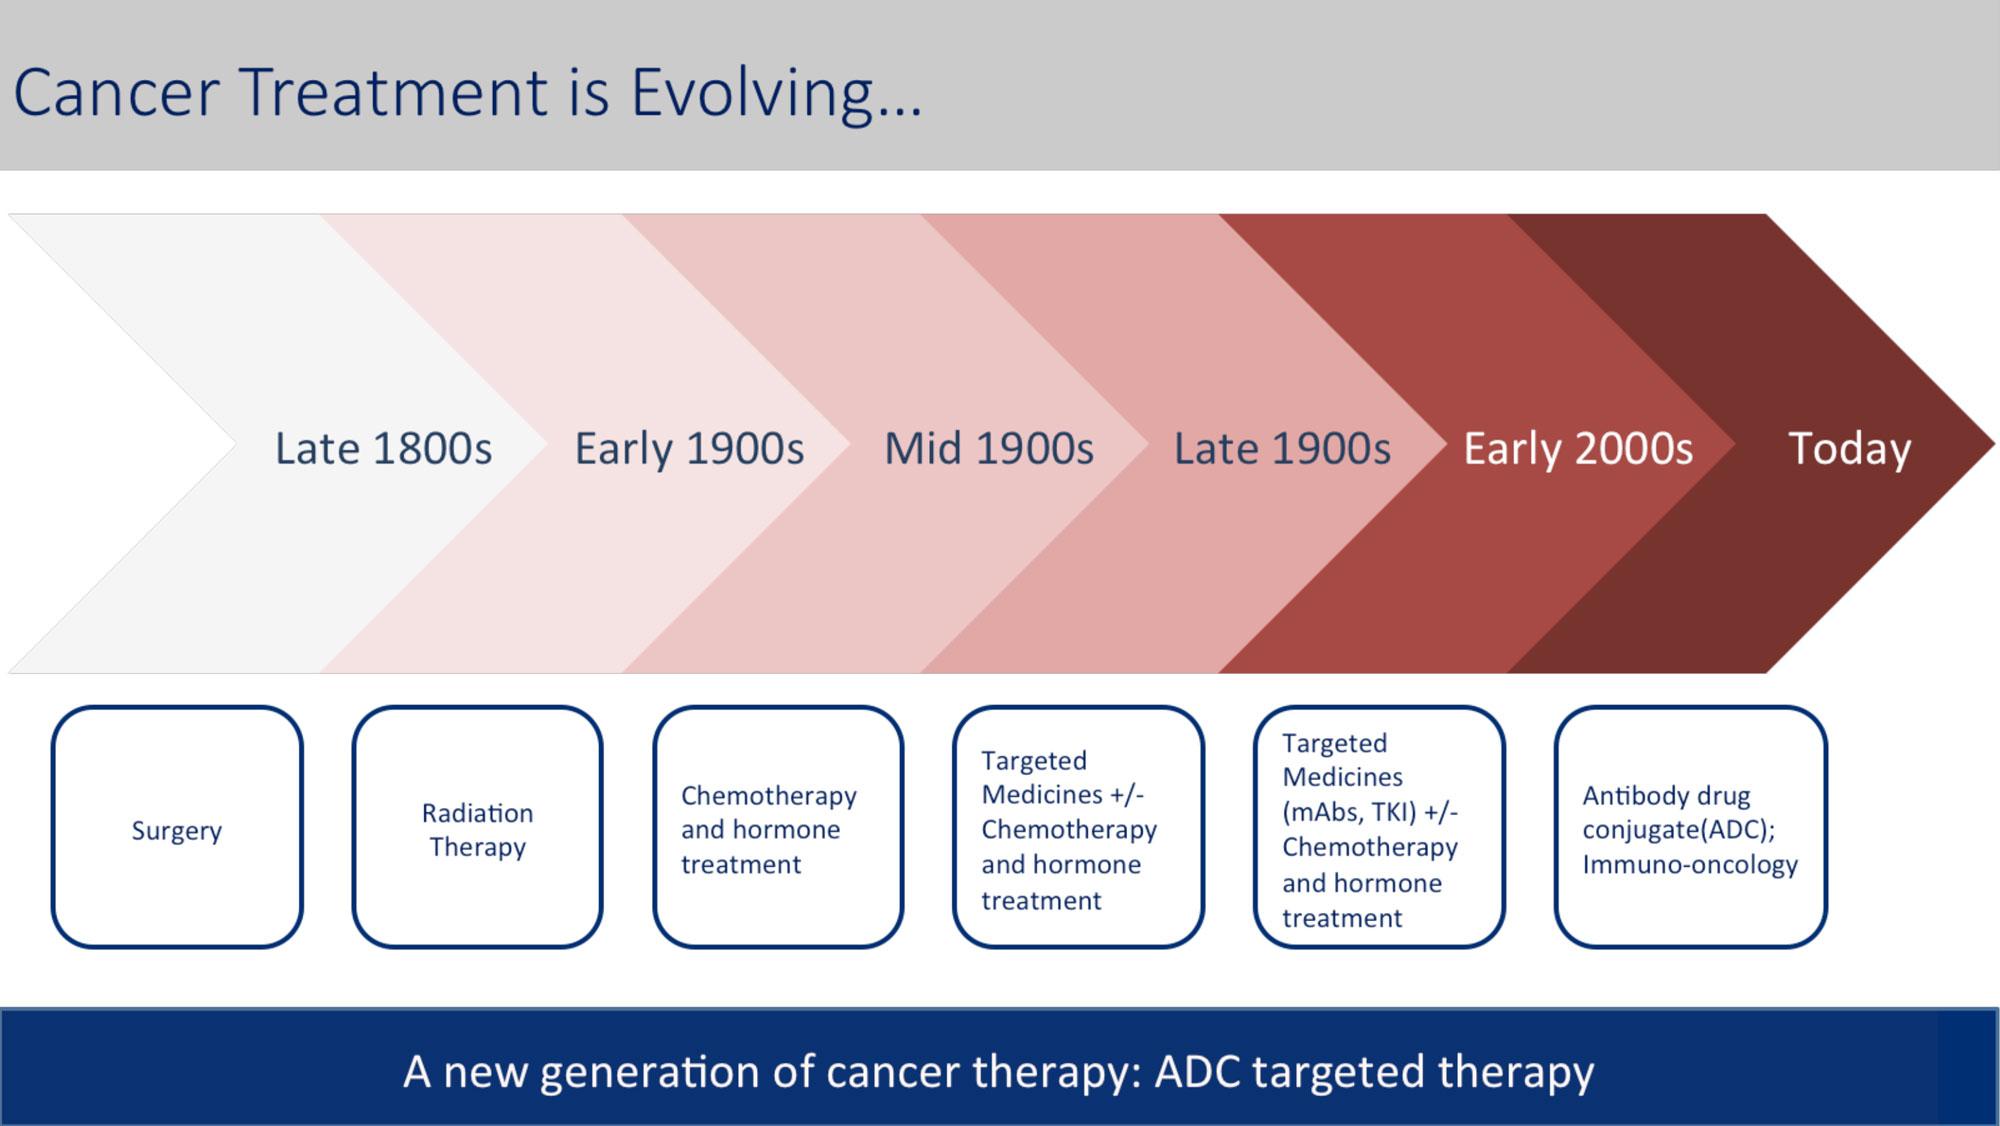 Cancer Treatment Evolving